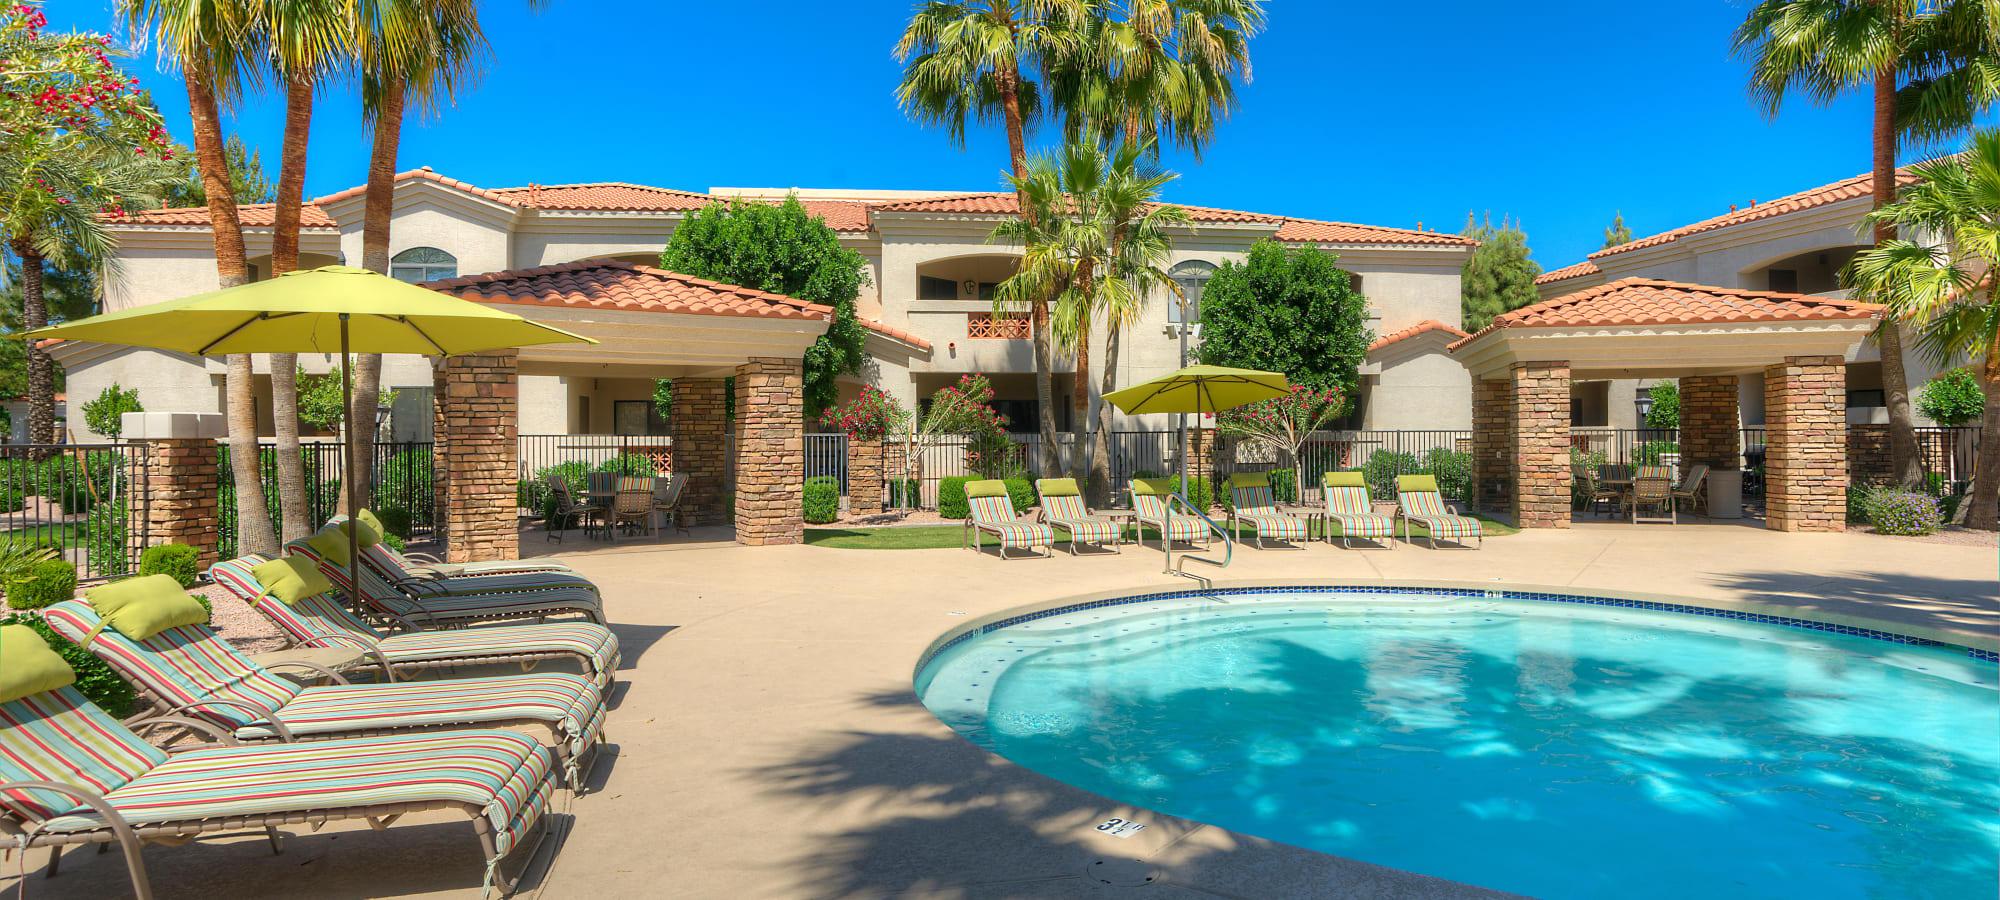 Lounge chairs surround the resort-style swimming pool at San Prado in Glendale, Arizona